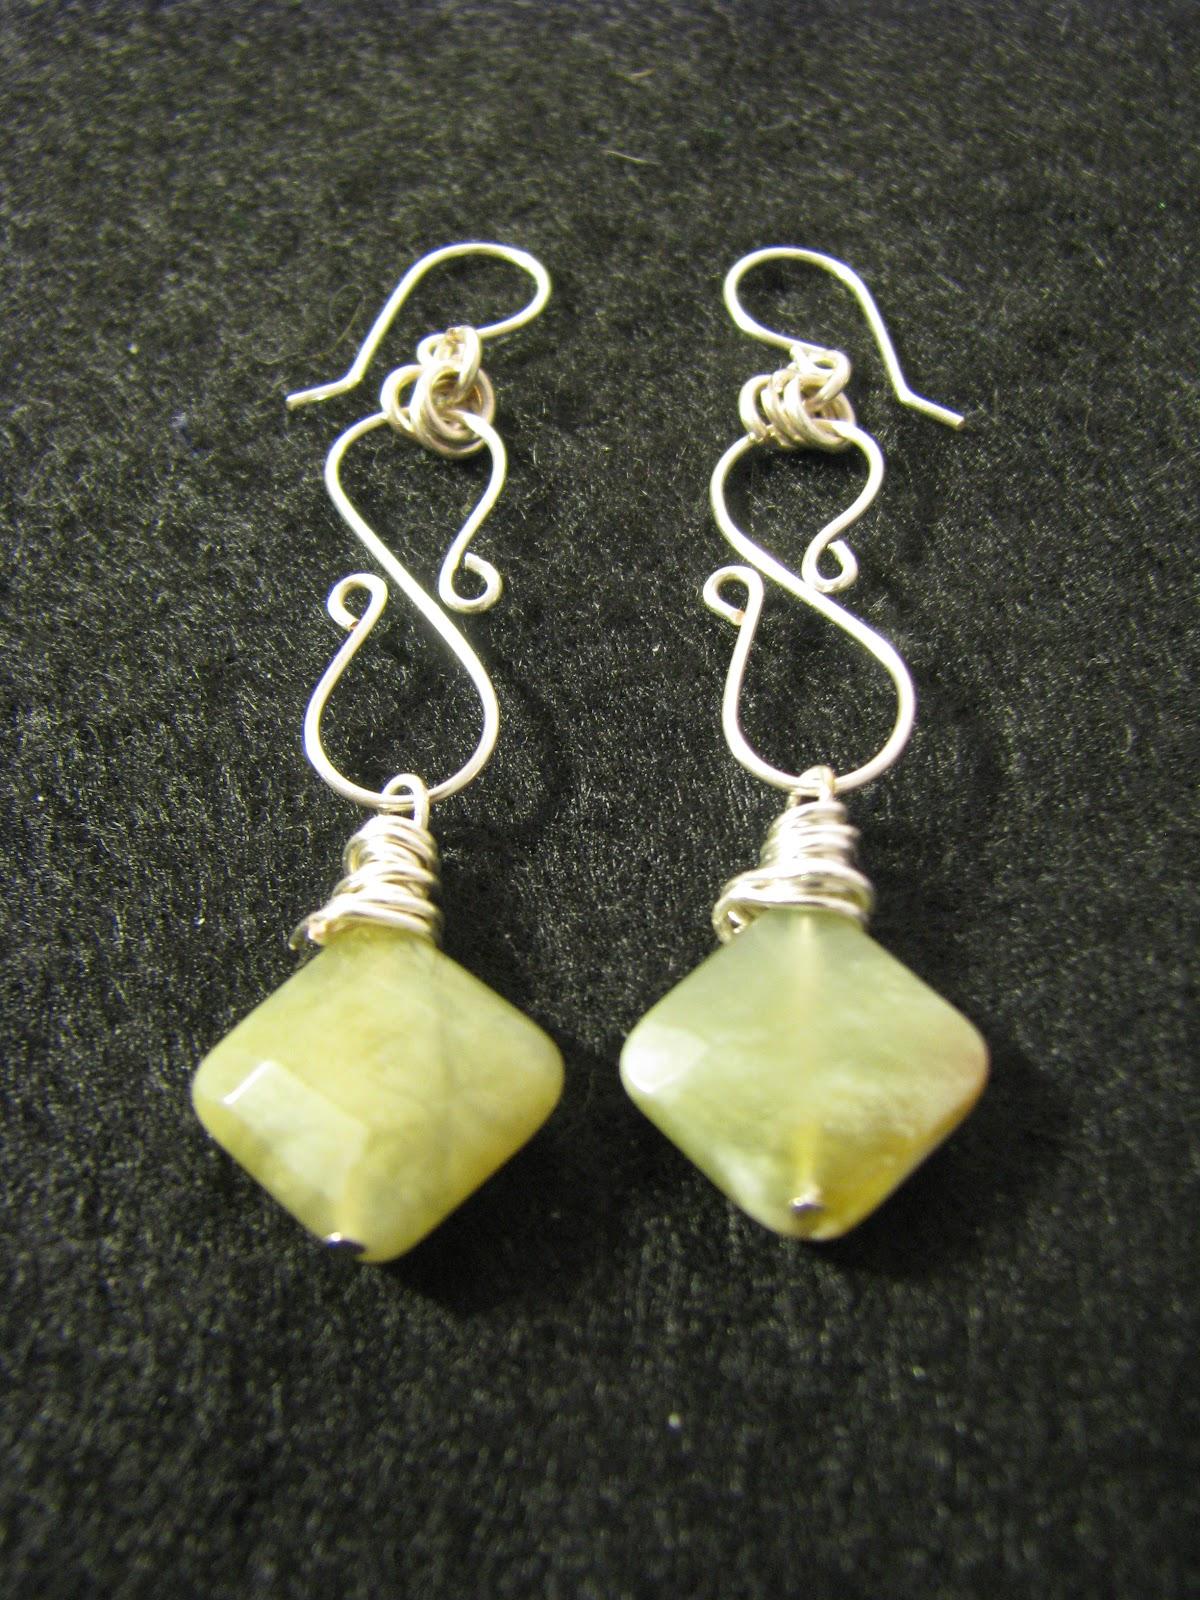 Designs By Debby: Swirled Wire Earrings